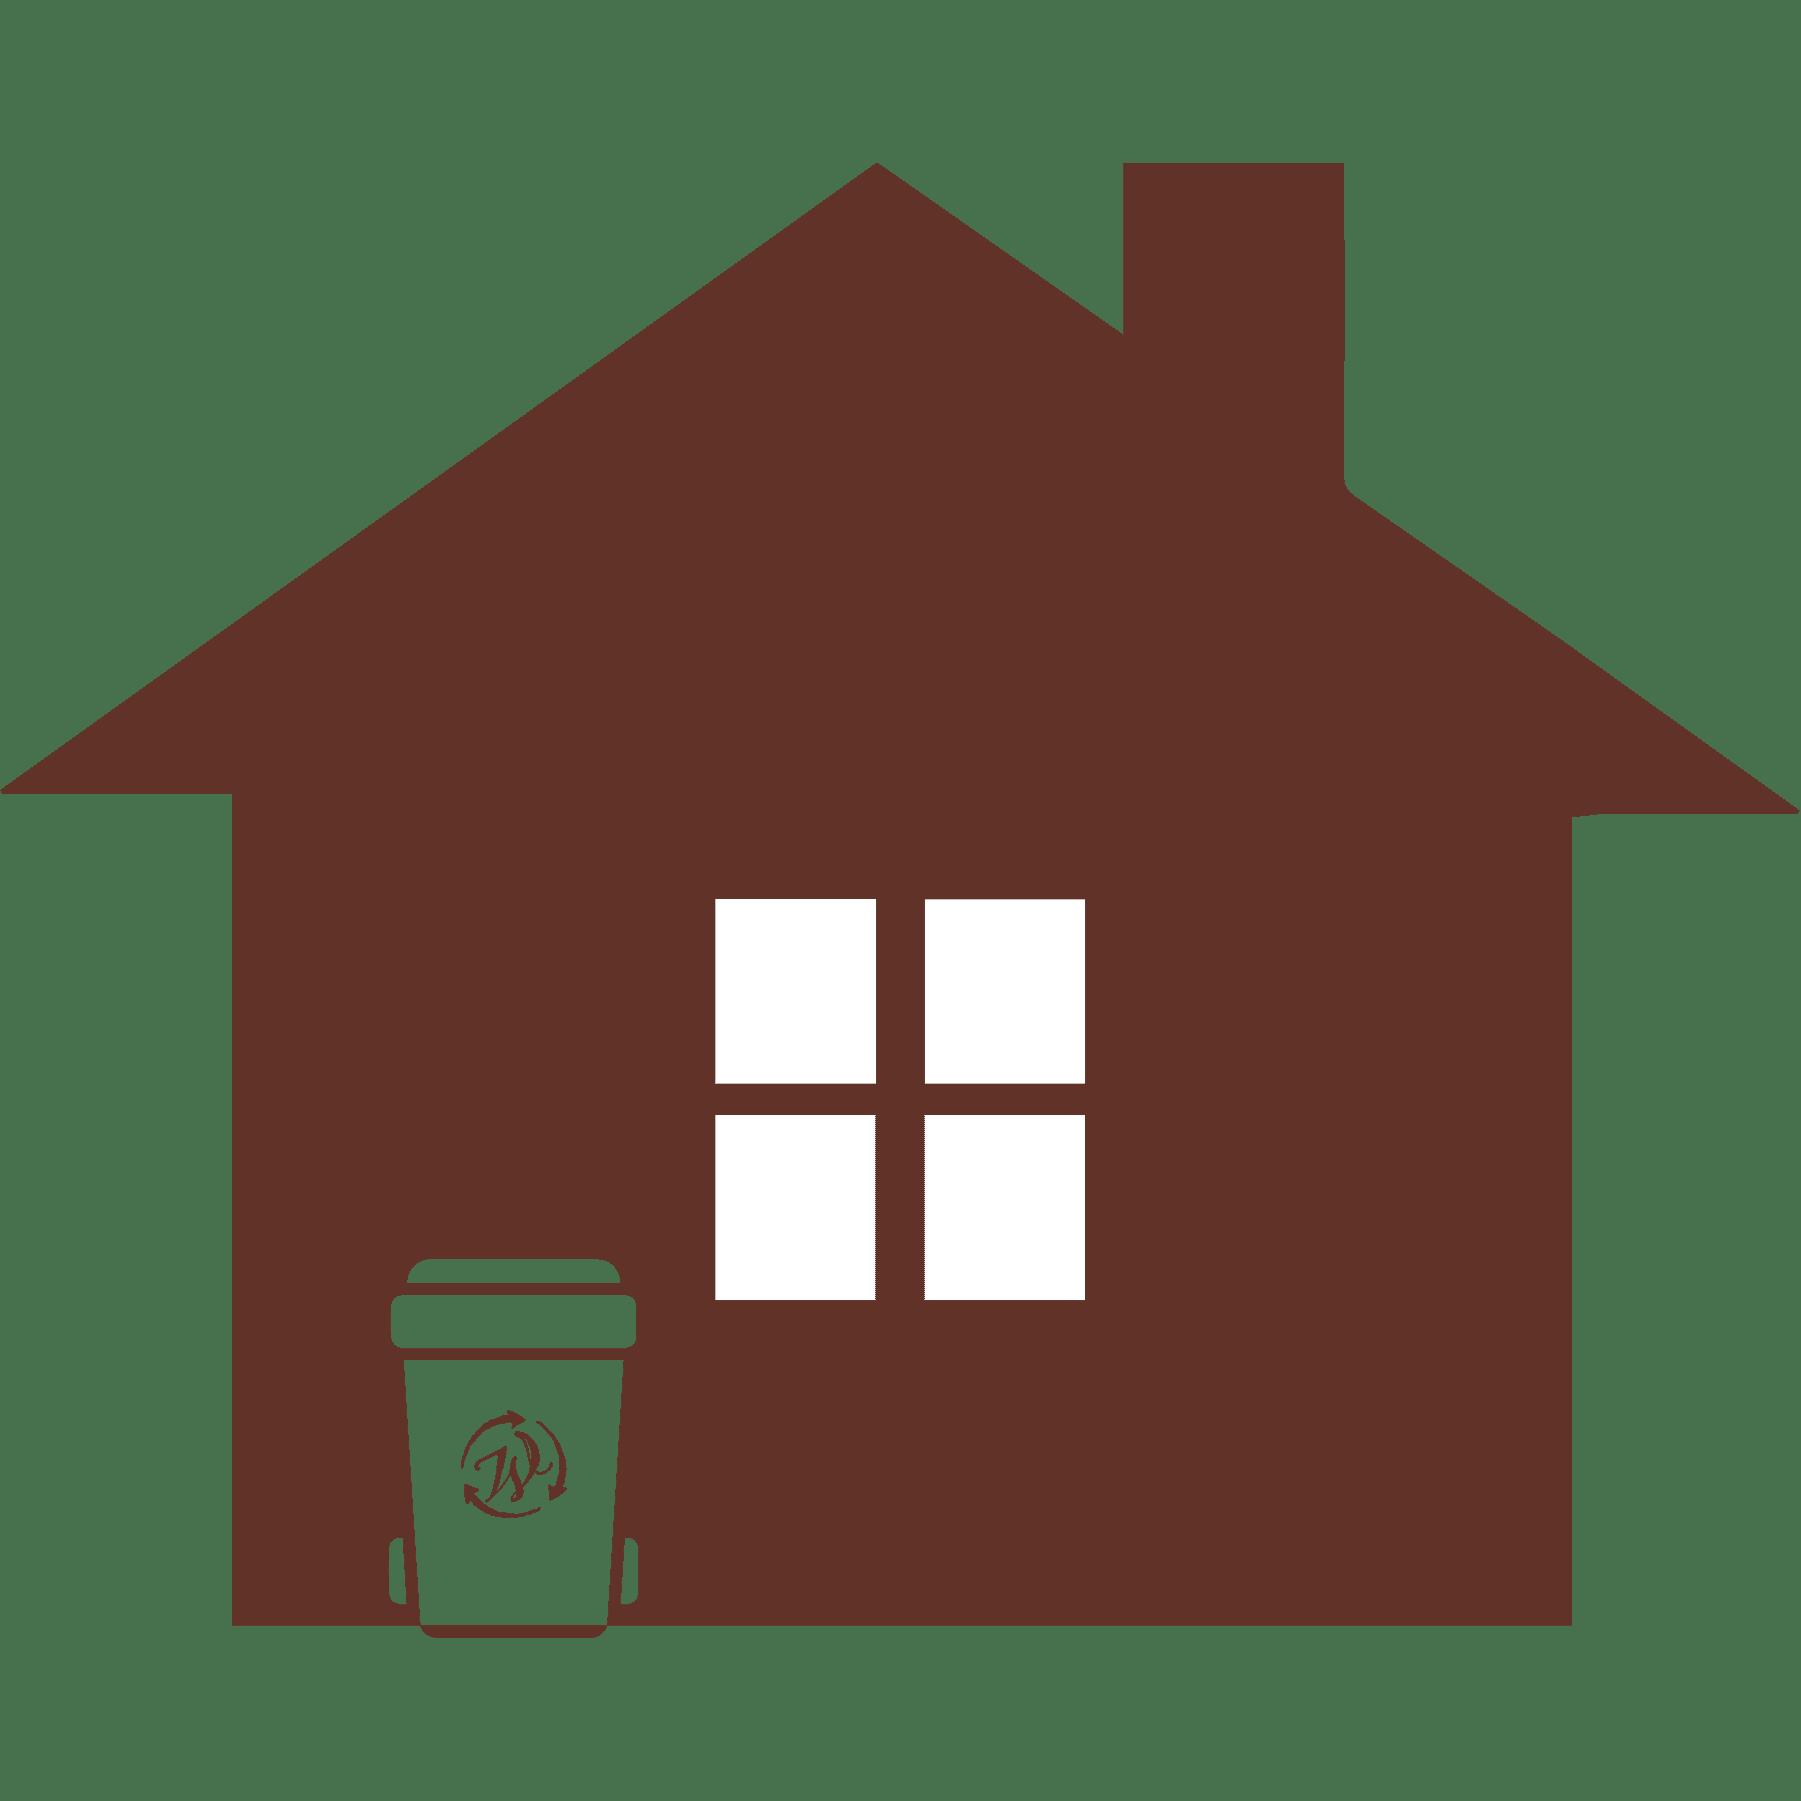 trash bin by house